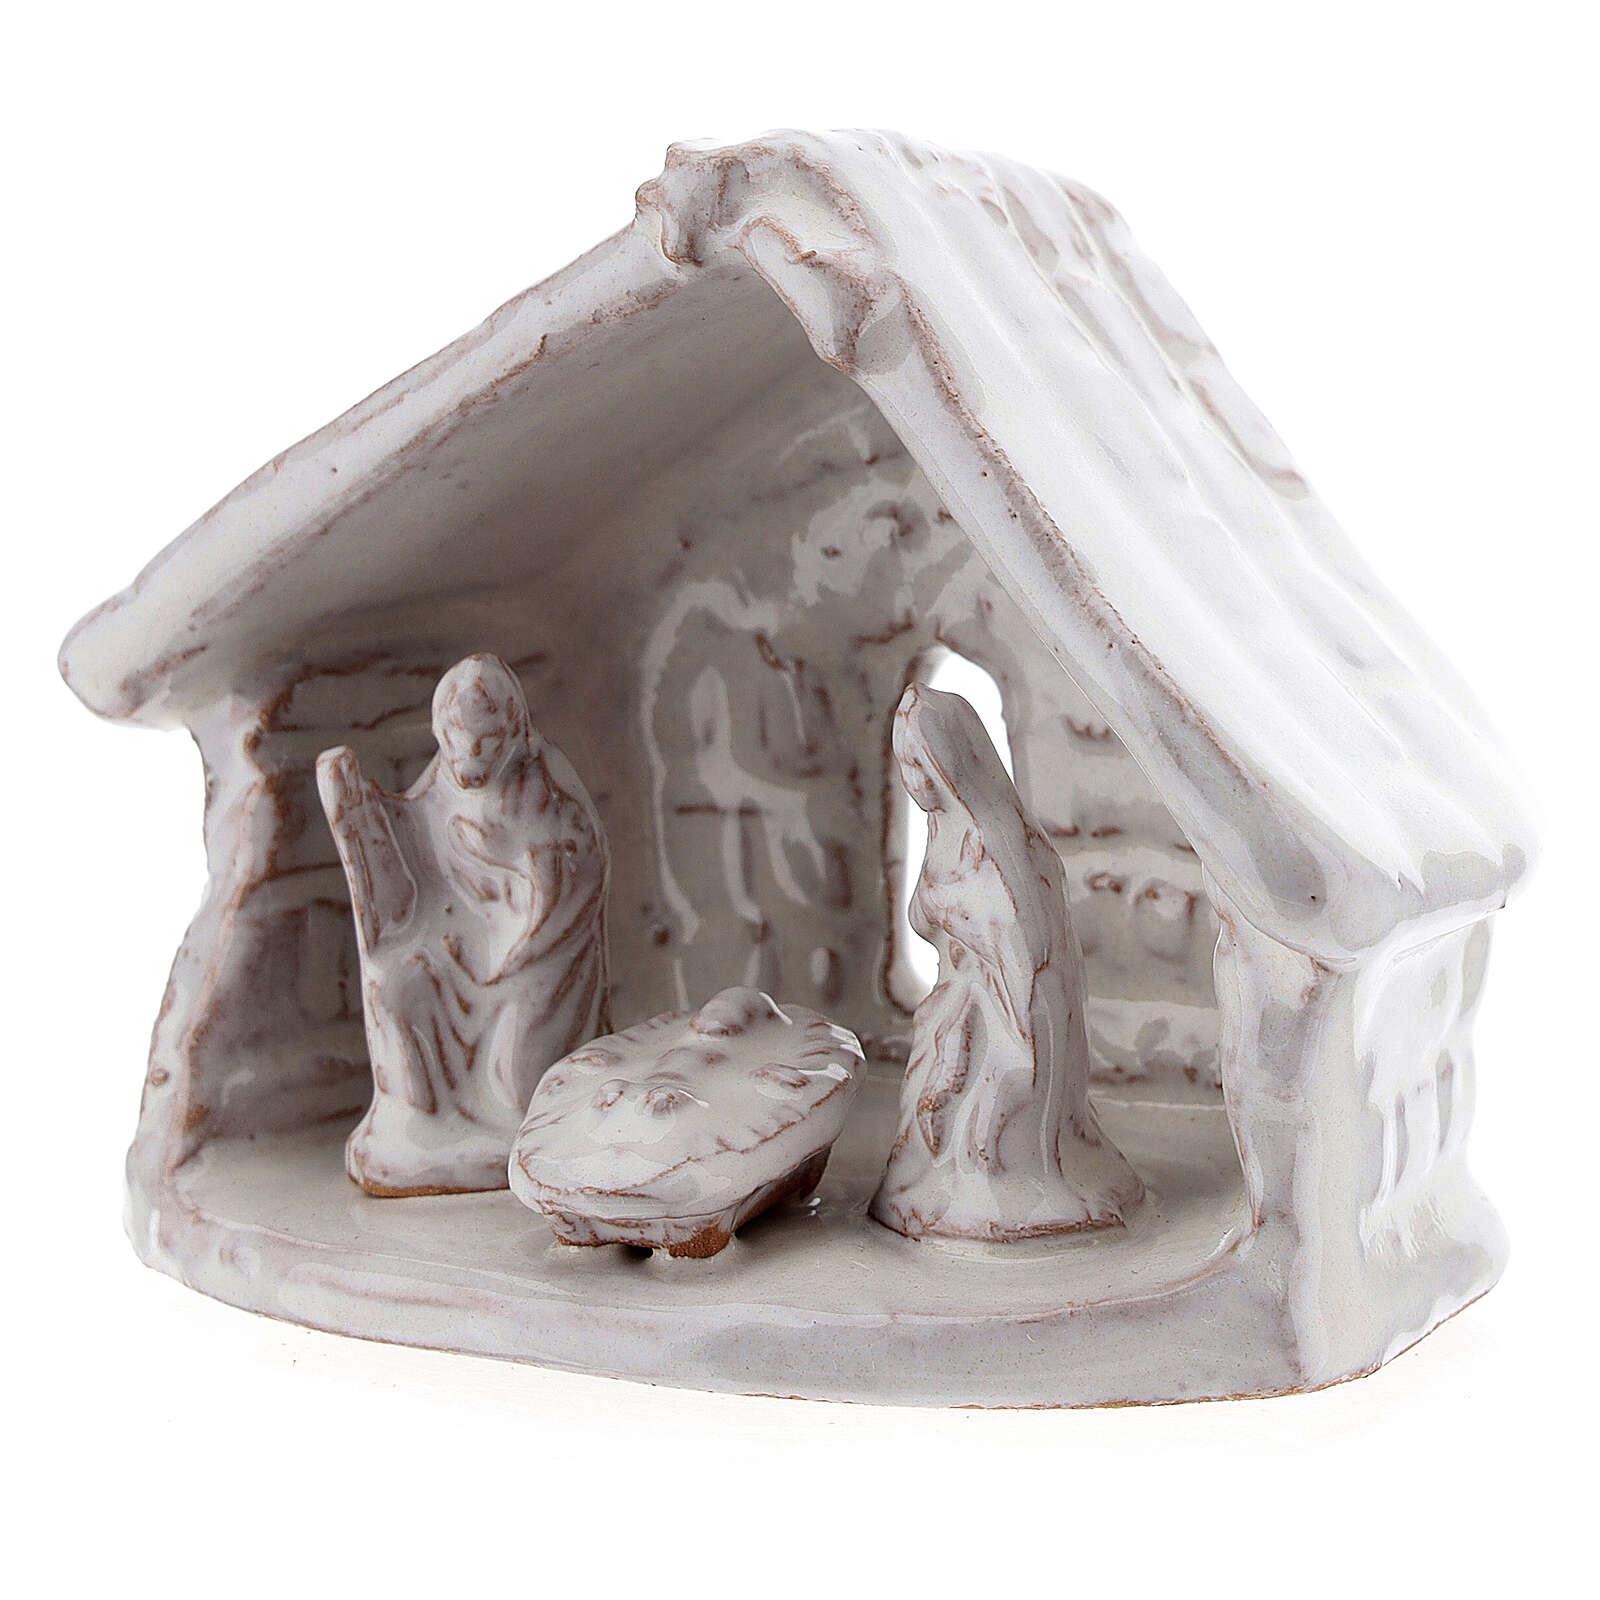 Mini cabaña natividad 6 cm terracota blanca Deruta 4